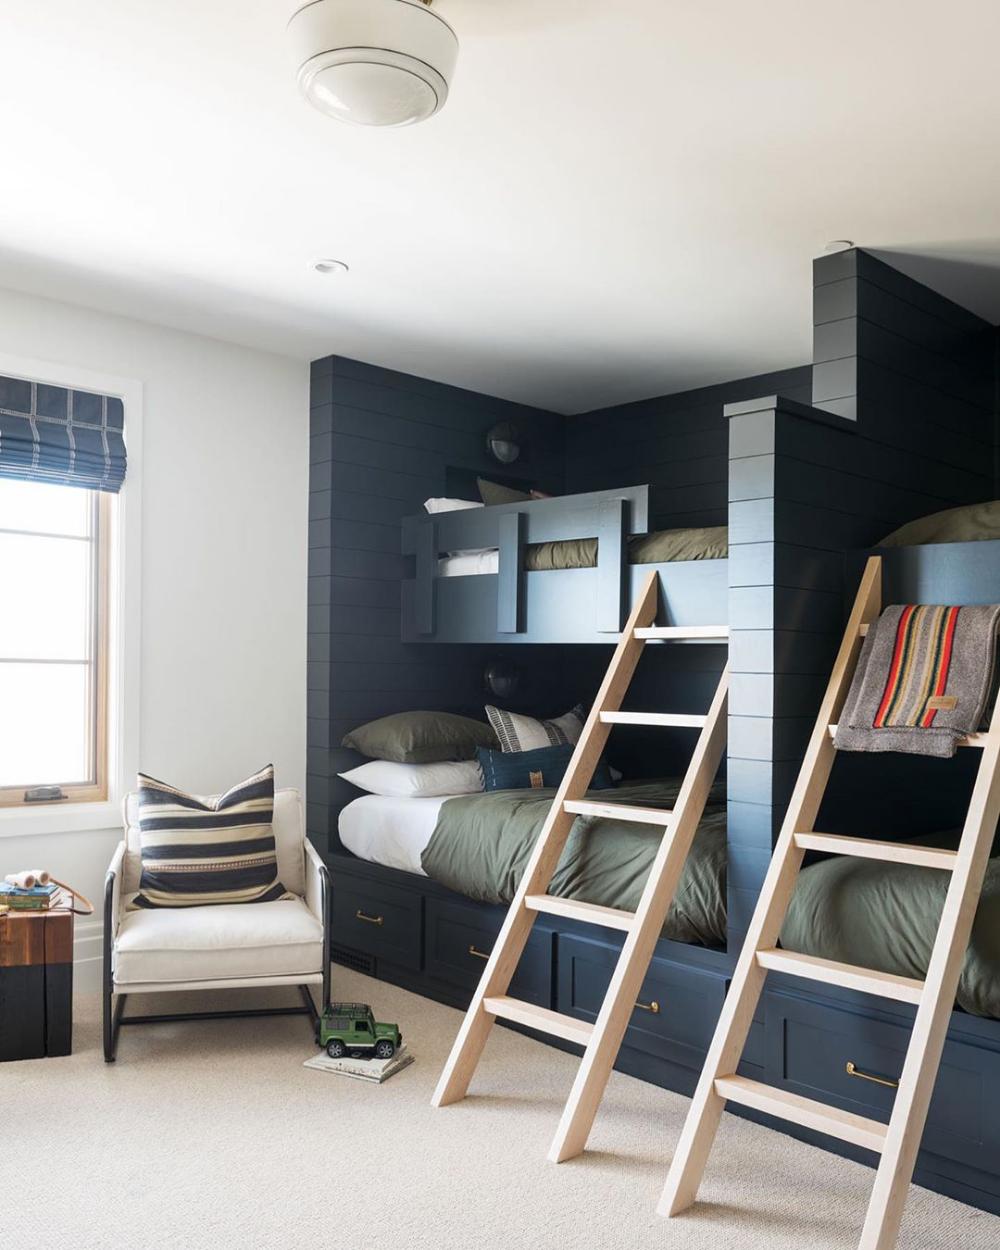 Double beds, great color. | Bedroom setup, Bunk beds built ...